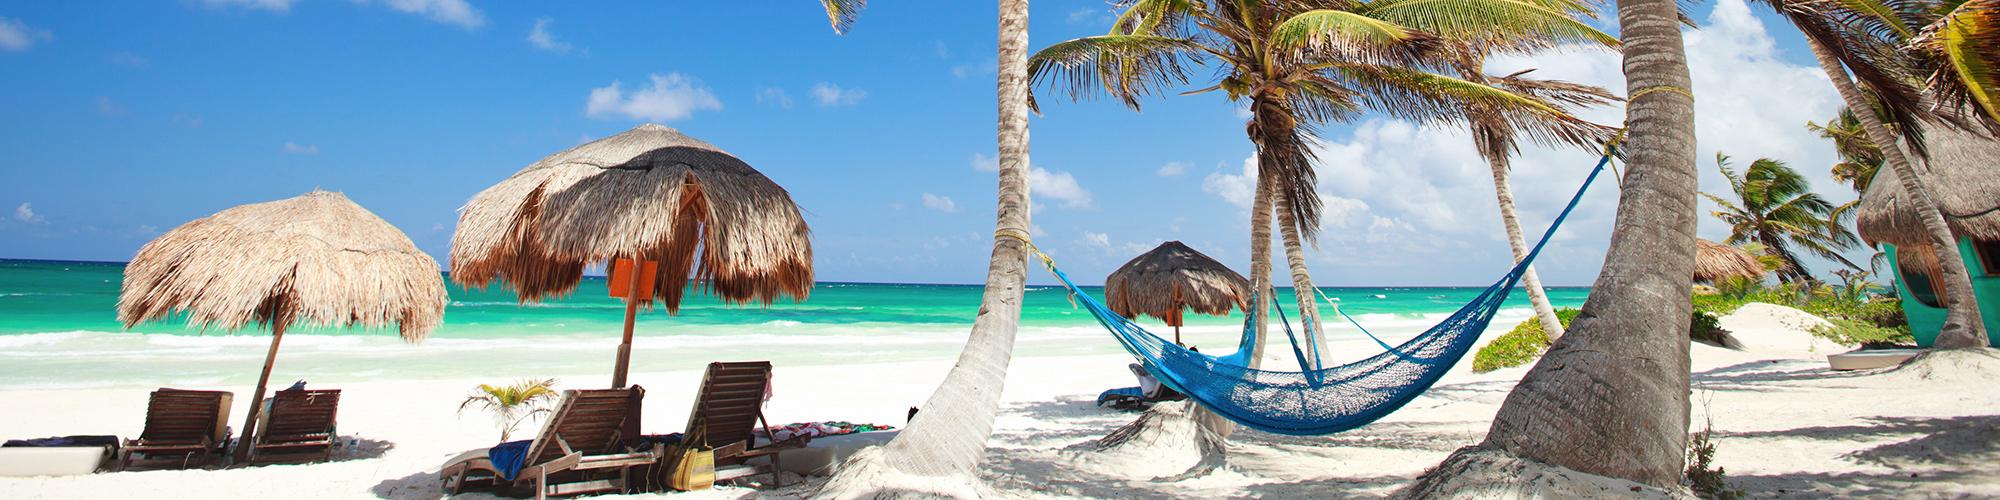 Last Minute Vacation Deals >> Last Minute Deals Travelzoo